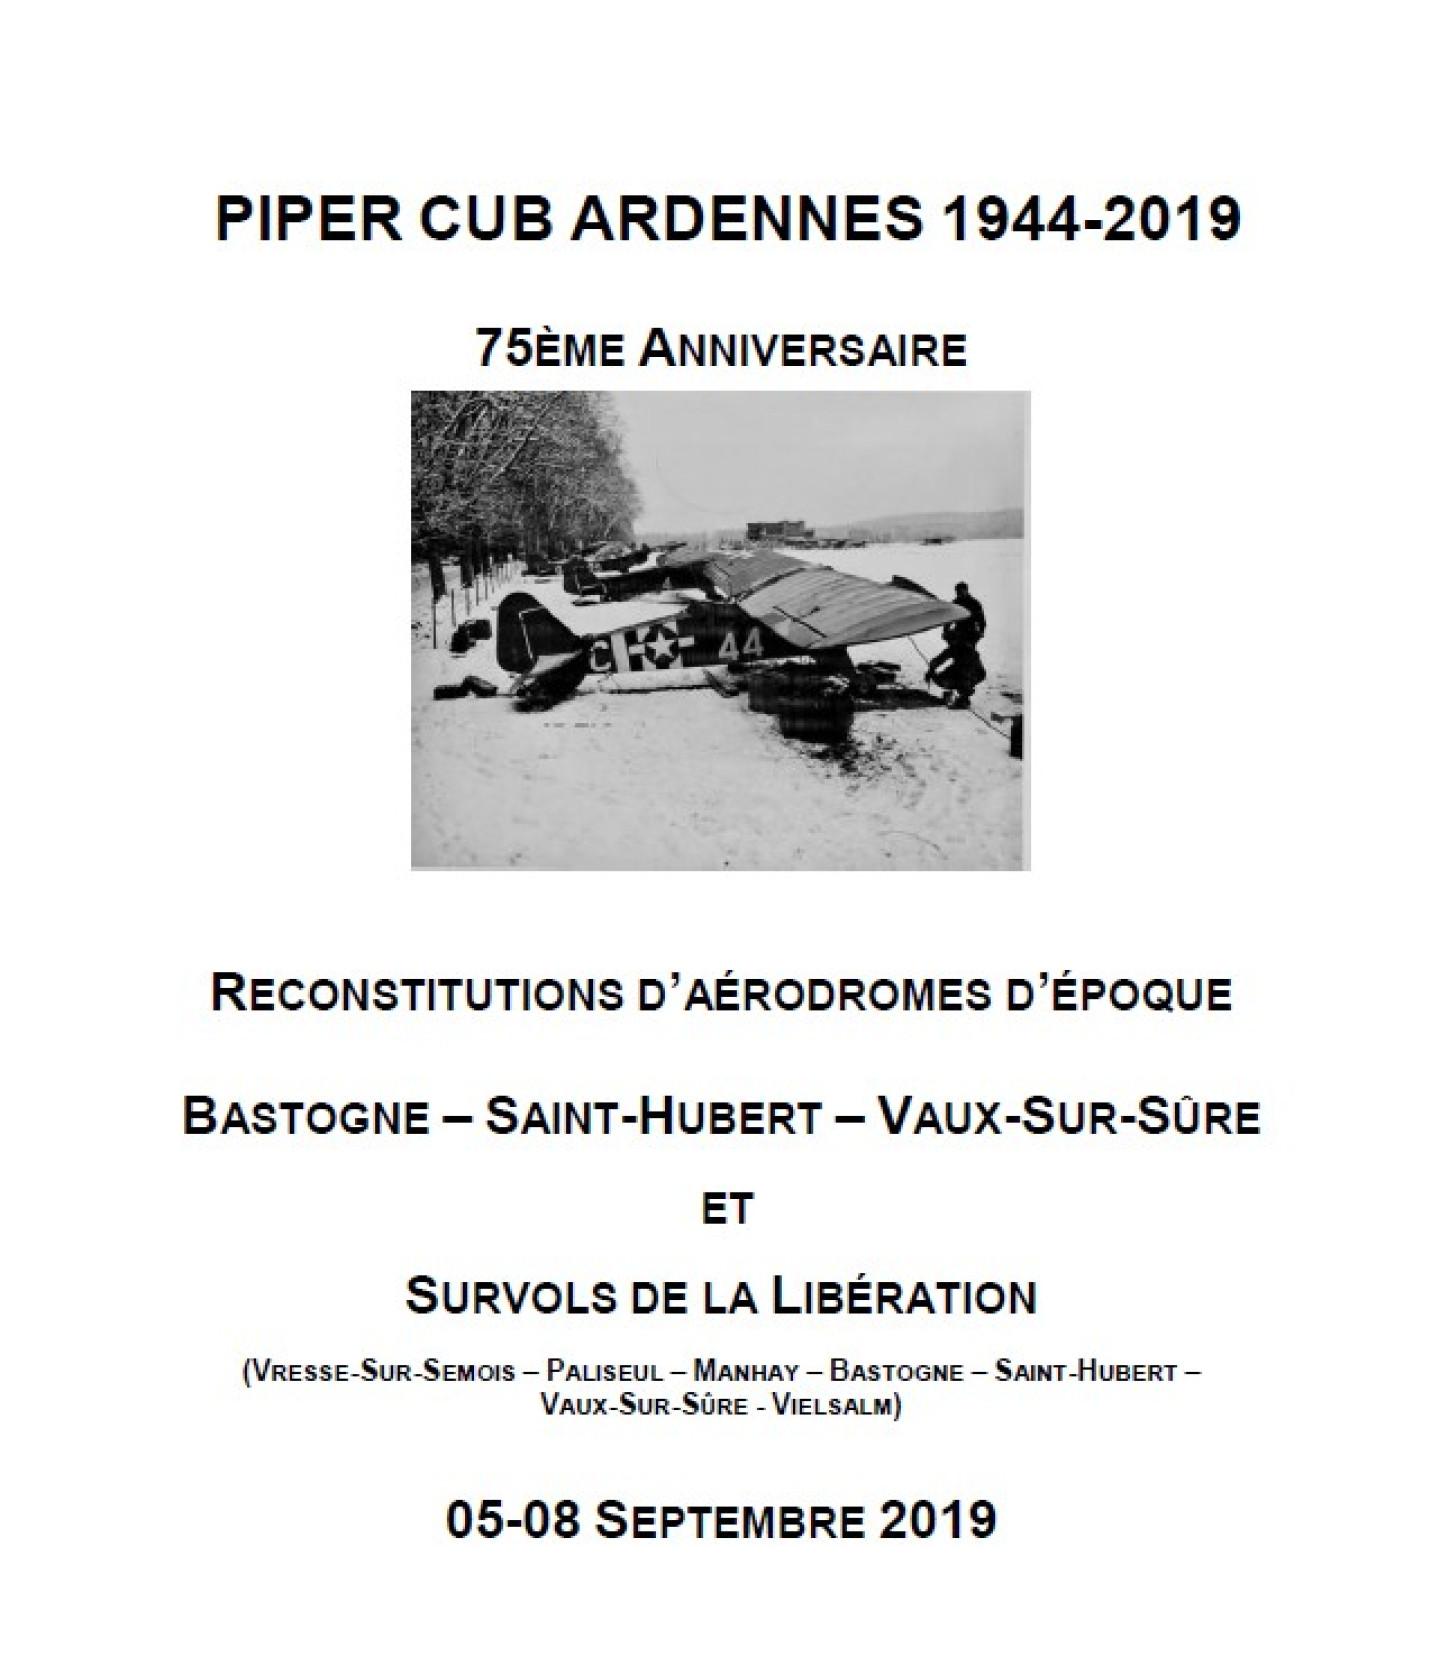 Piper Cub Ardennes 1944-2019